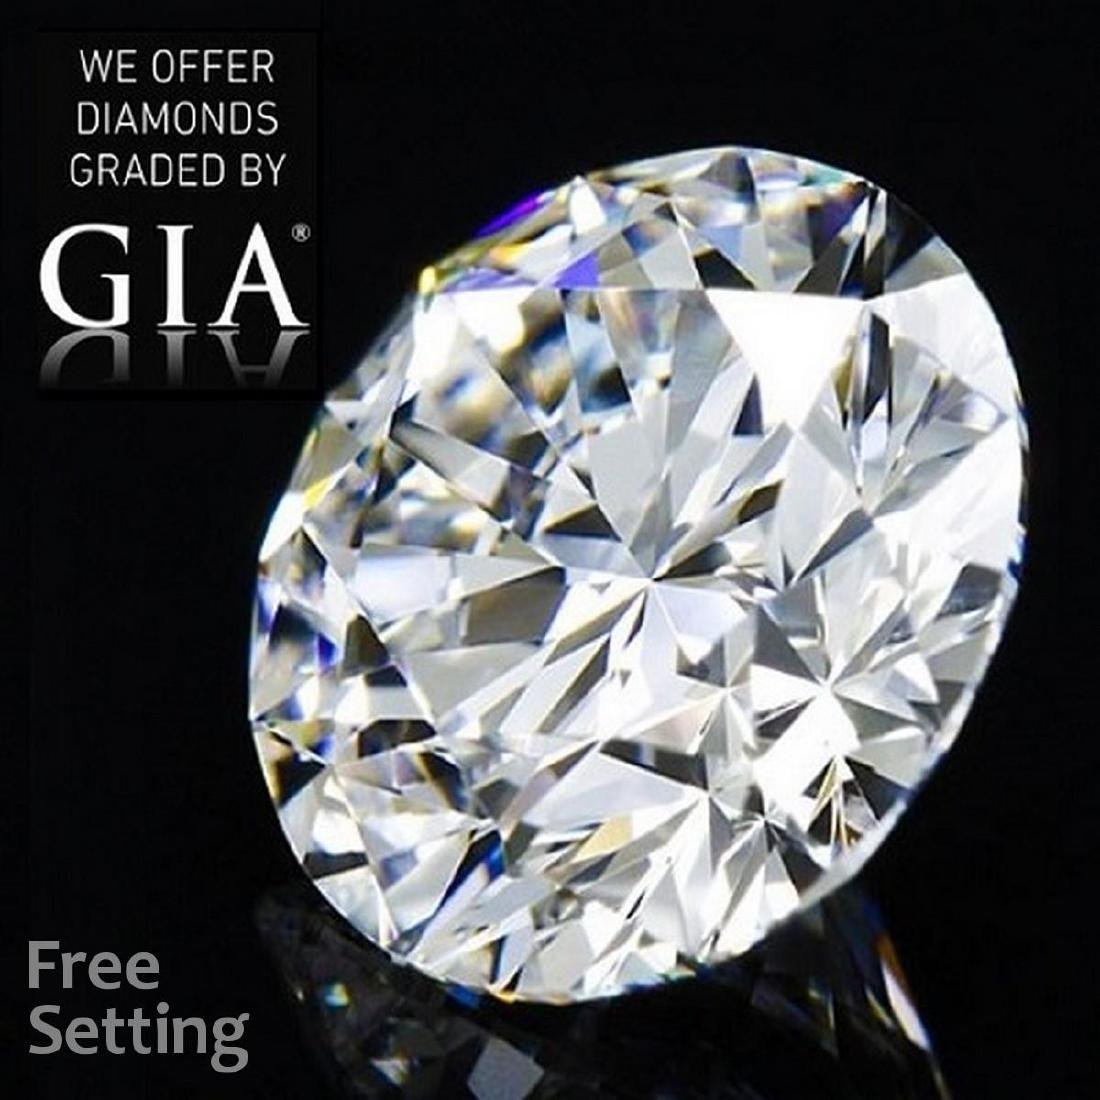 5.06 ct, Color E/VVS1, Round cut Diamond